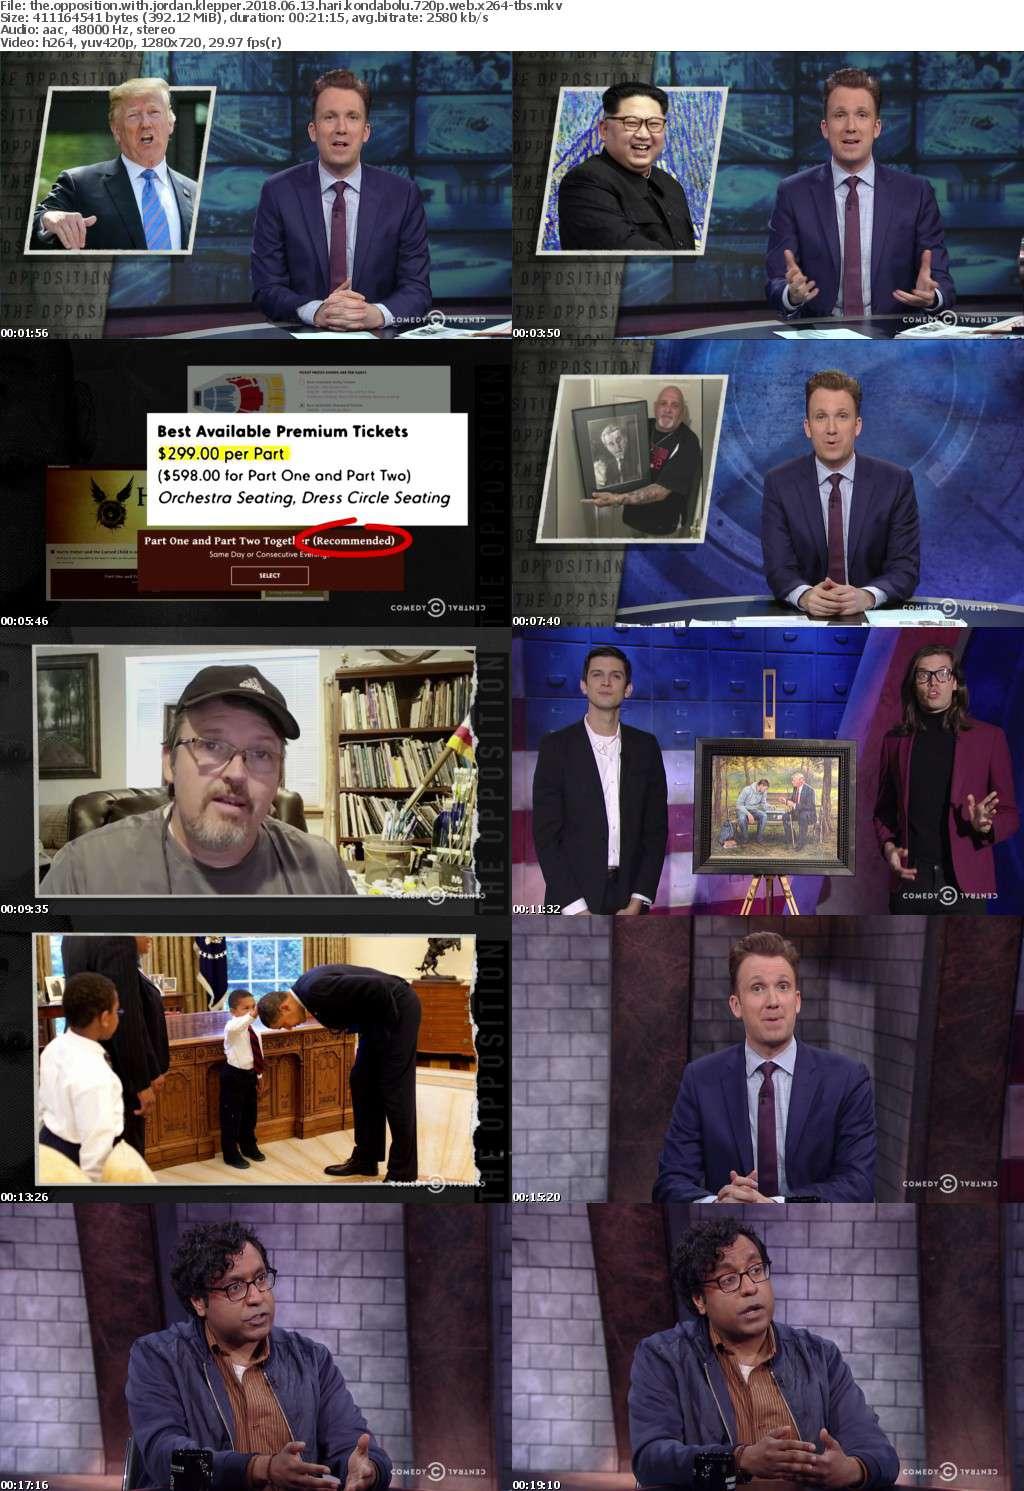 The Opposition with Jordan Klepper 2018 06 13 Hari Kondabolu 720p WEB x264-TBS